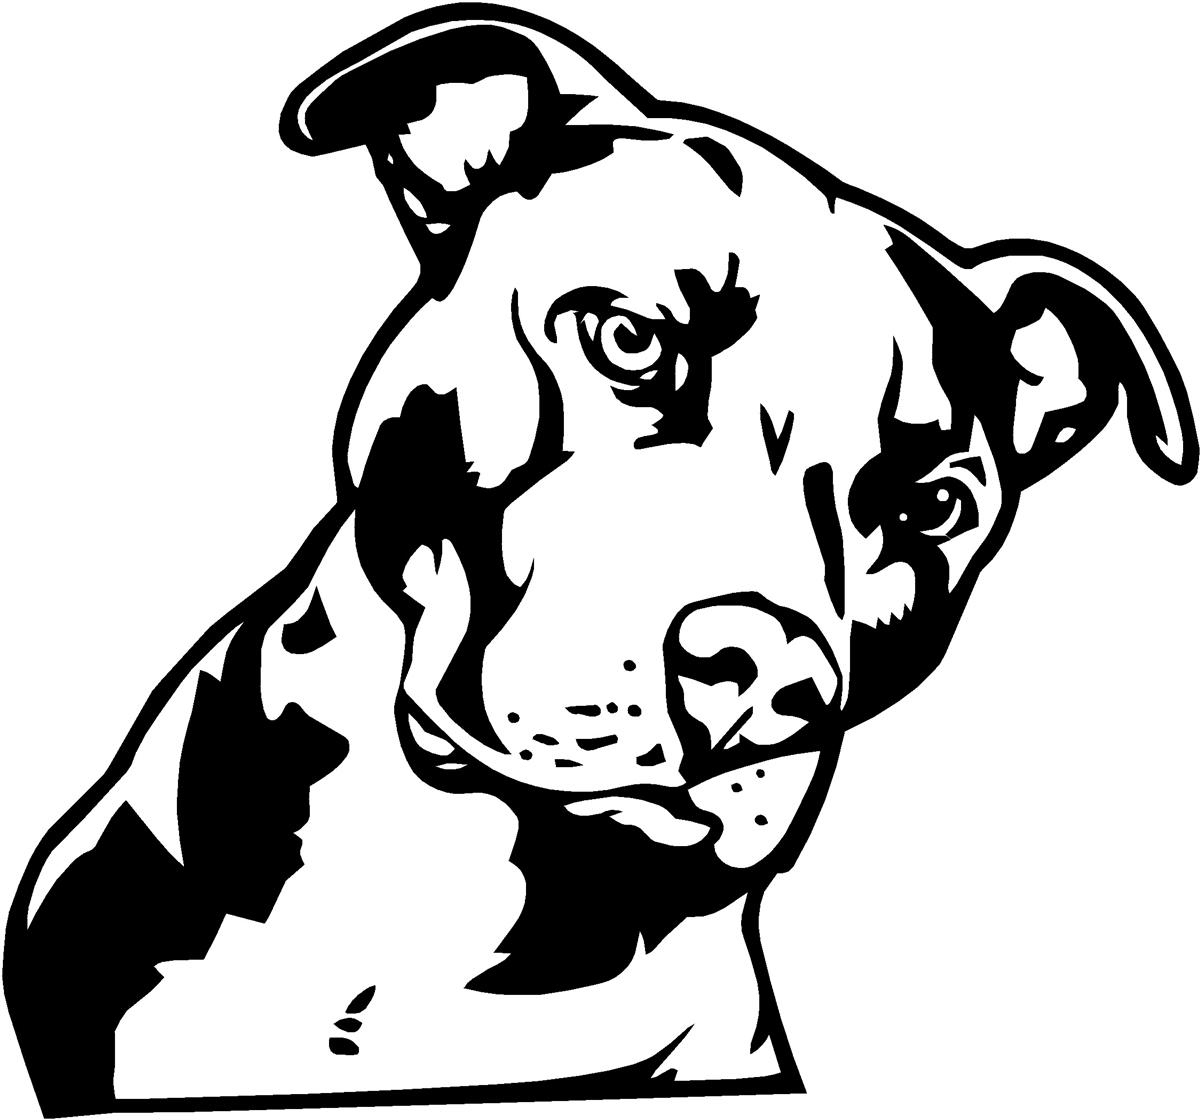 1201x1120 Pitbull Dog Black And White Drawings